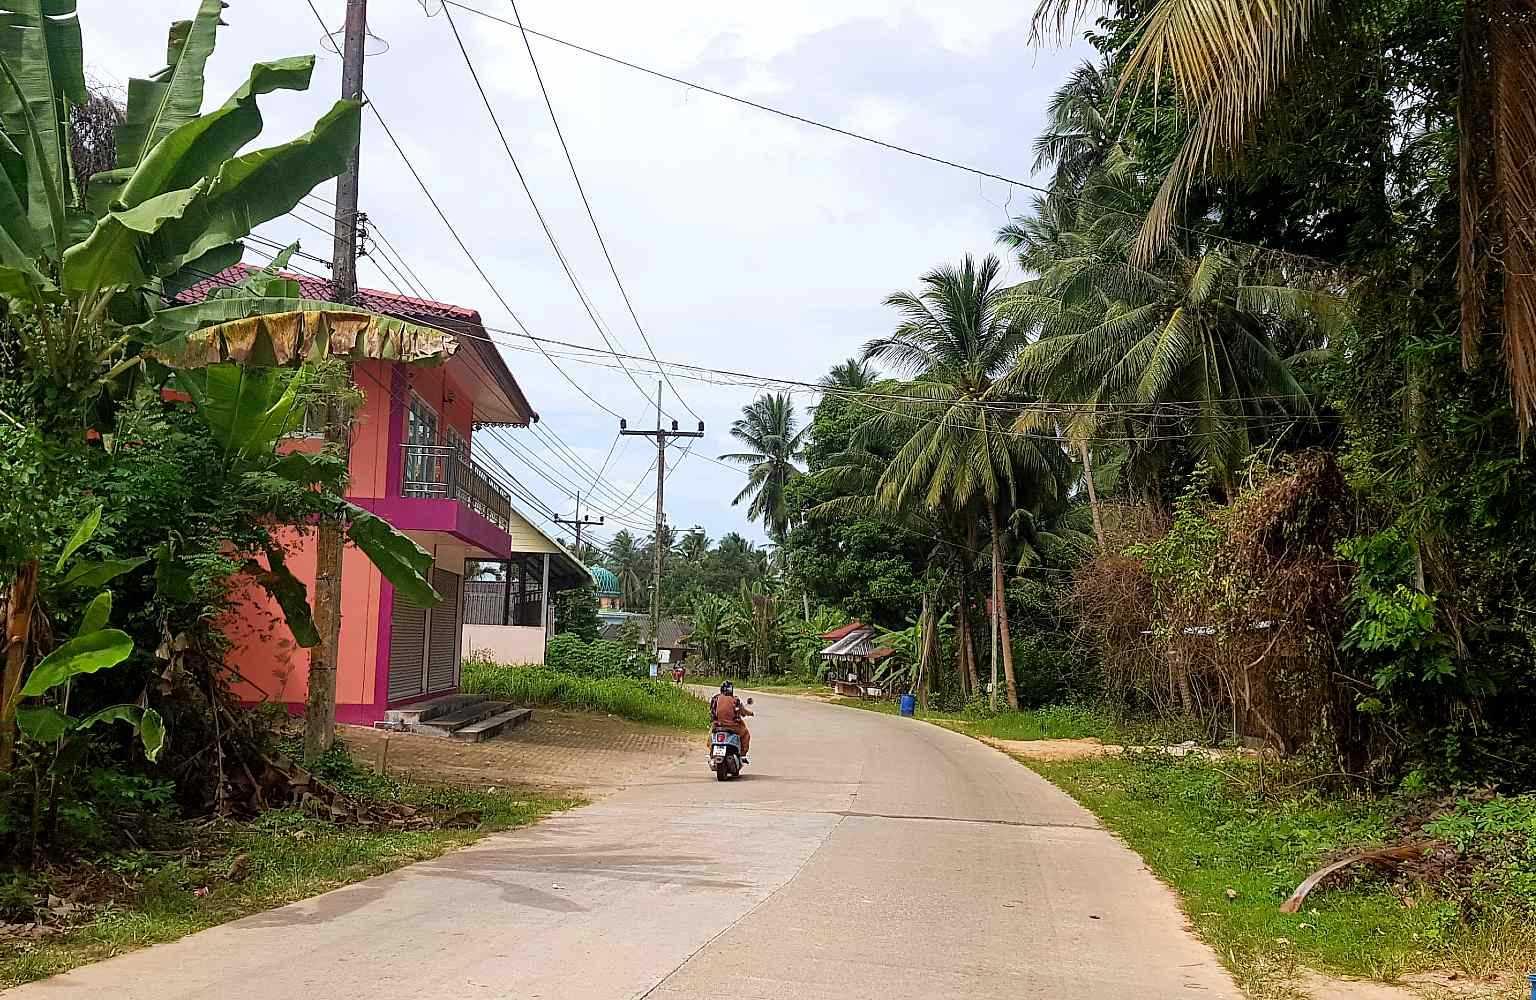 Riding the scooter through Koh Yao Yai